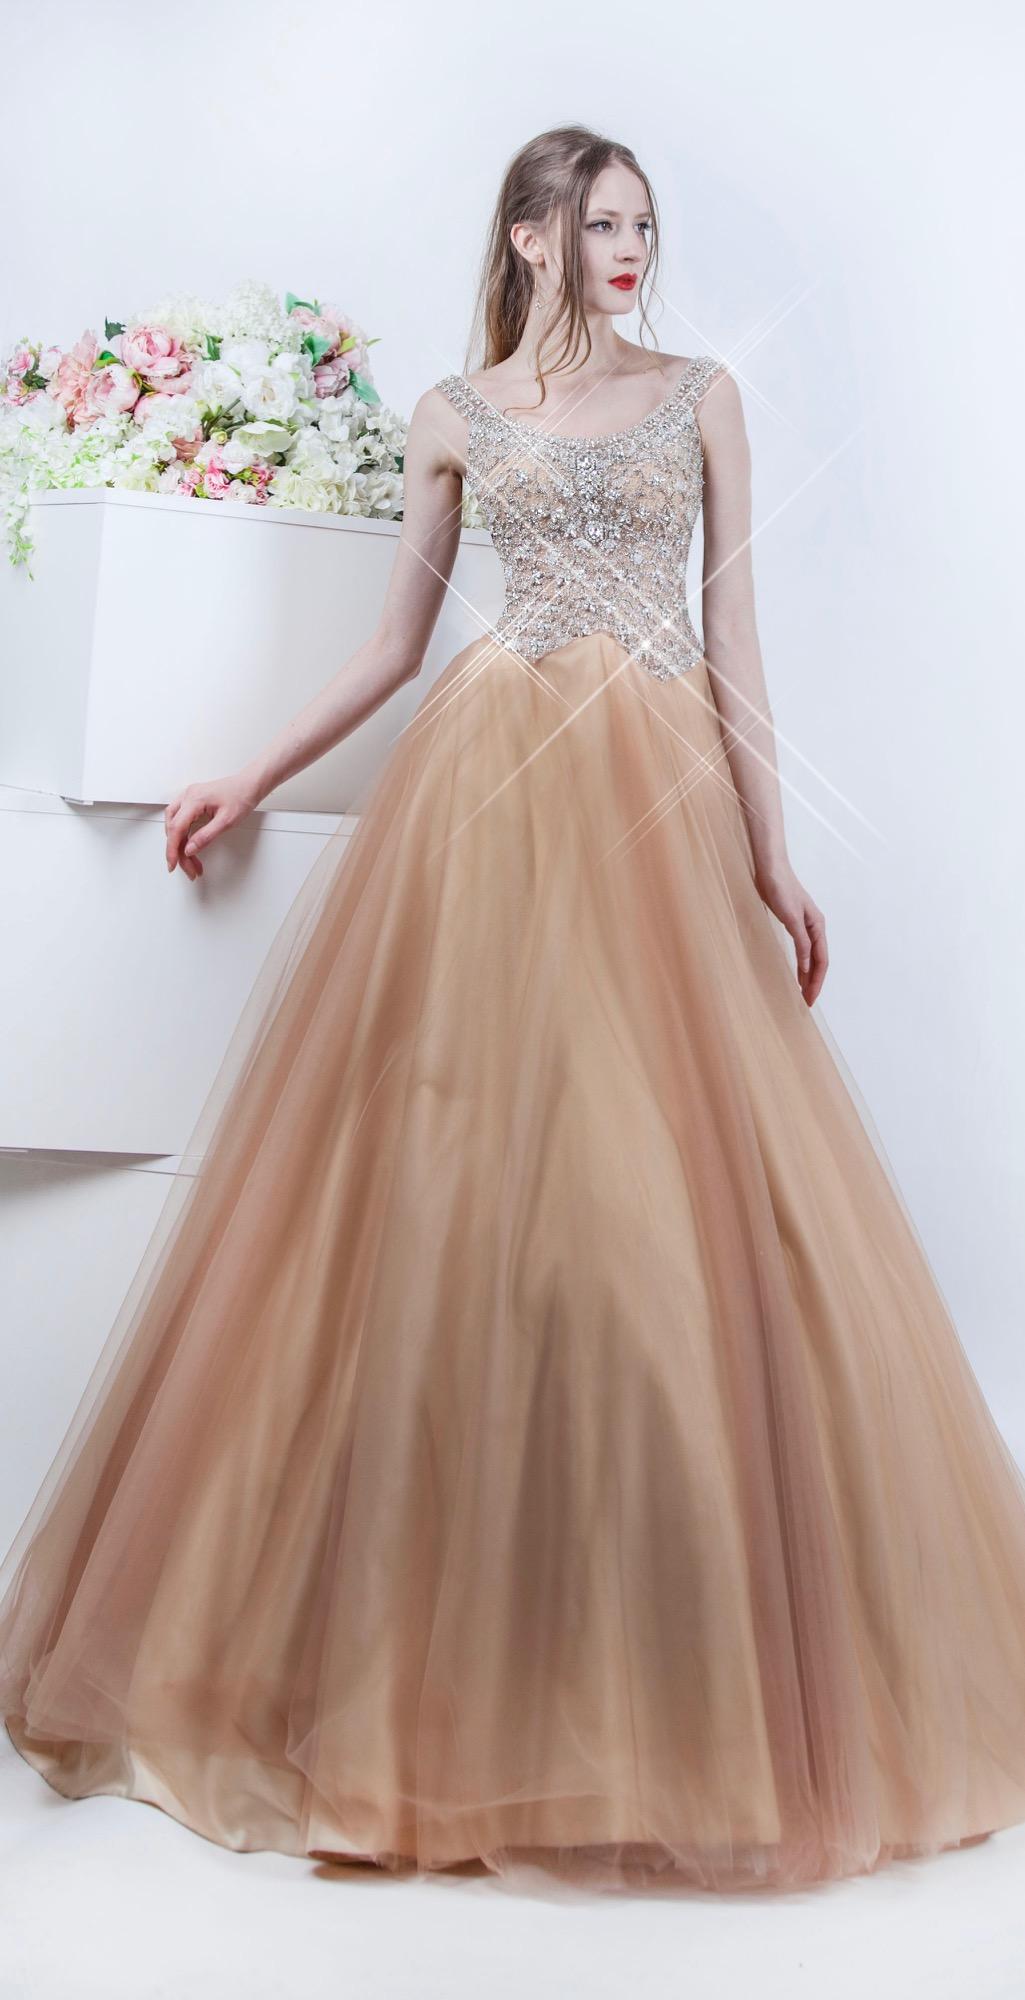 acheter robe de bal à Paris